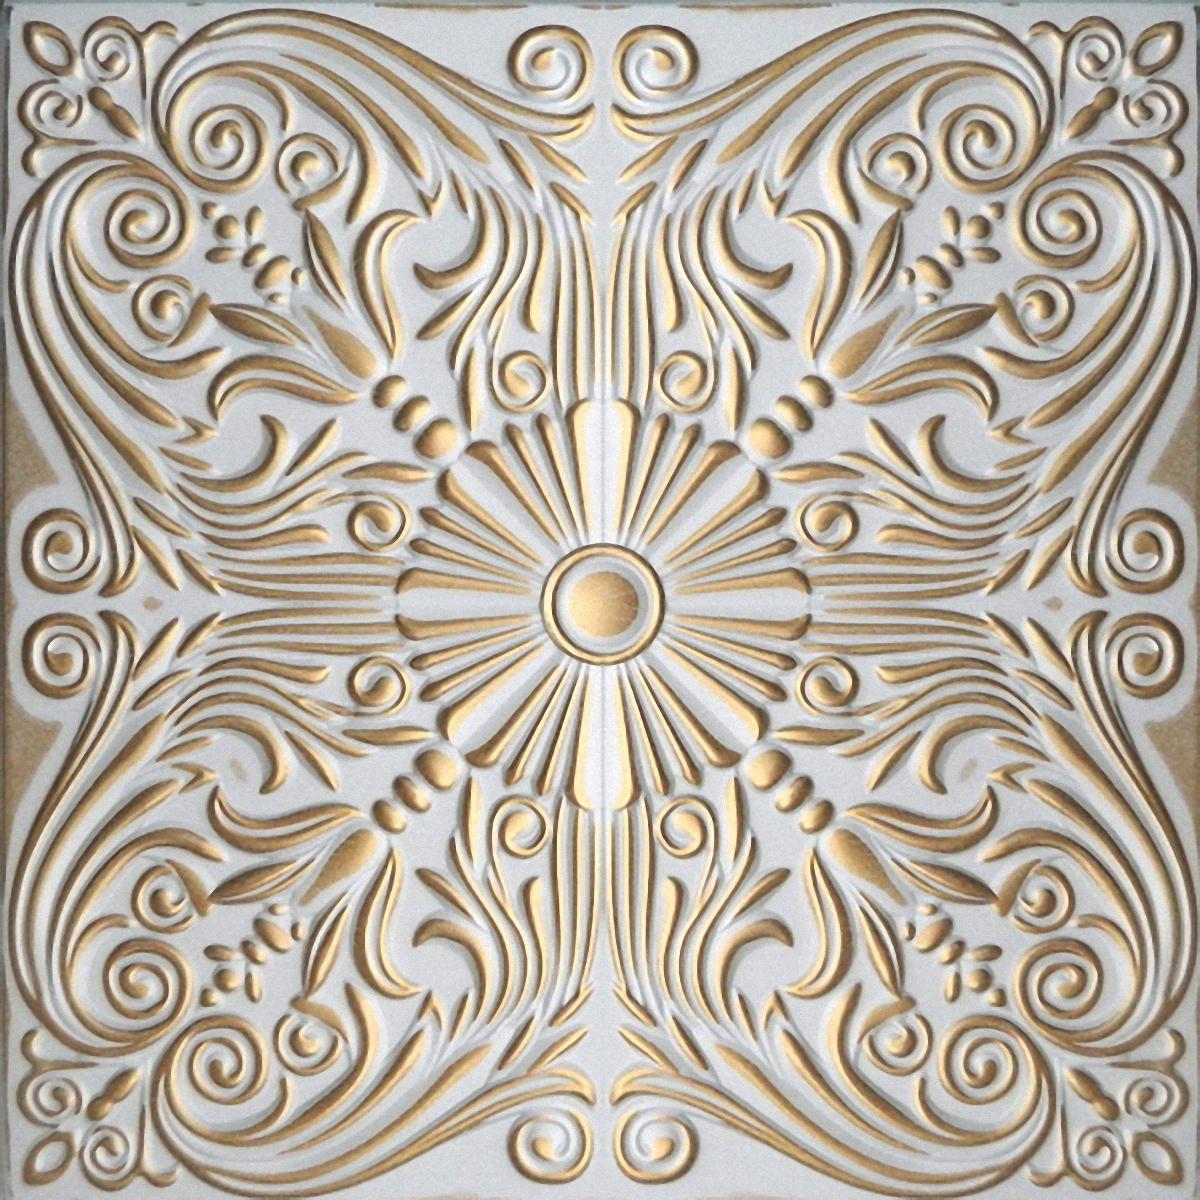 Topceilingtiles on twitter new hand painted polystyrene foam hand painted polystyrene foam ceiling tiles retro httptaketvqt81h httpt1azailxozc dailygadgetfo Images